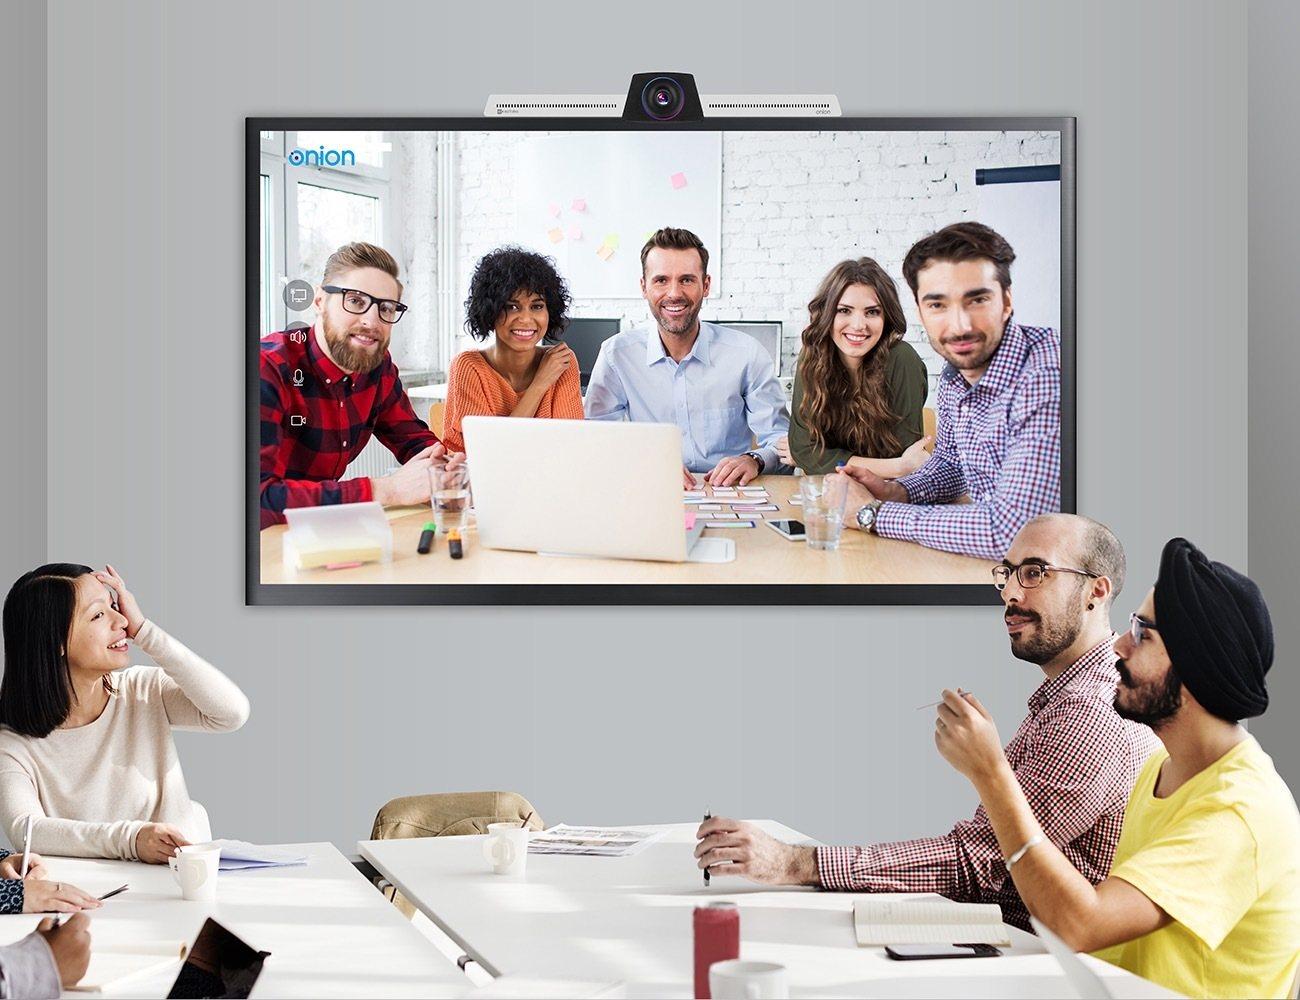 EZTalks+Onion+Video+Conferencing+Equipment